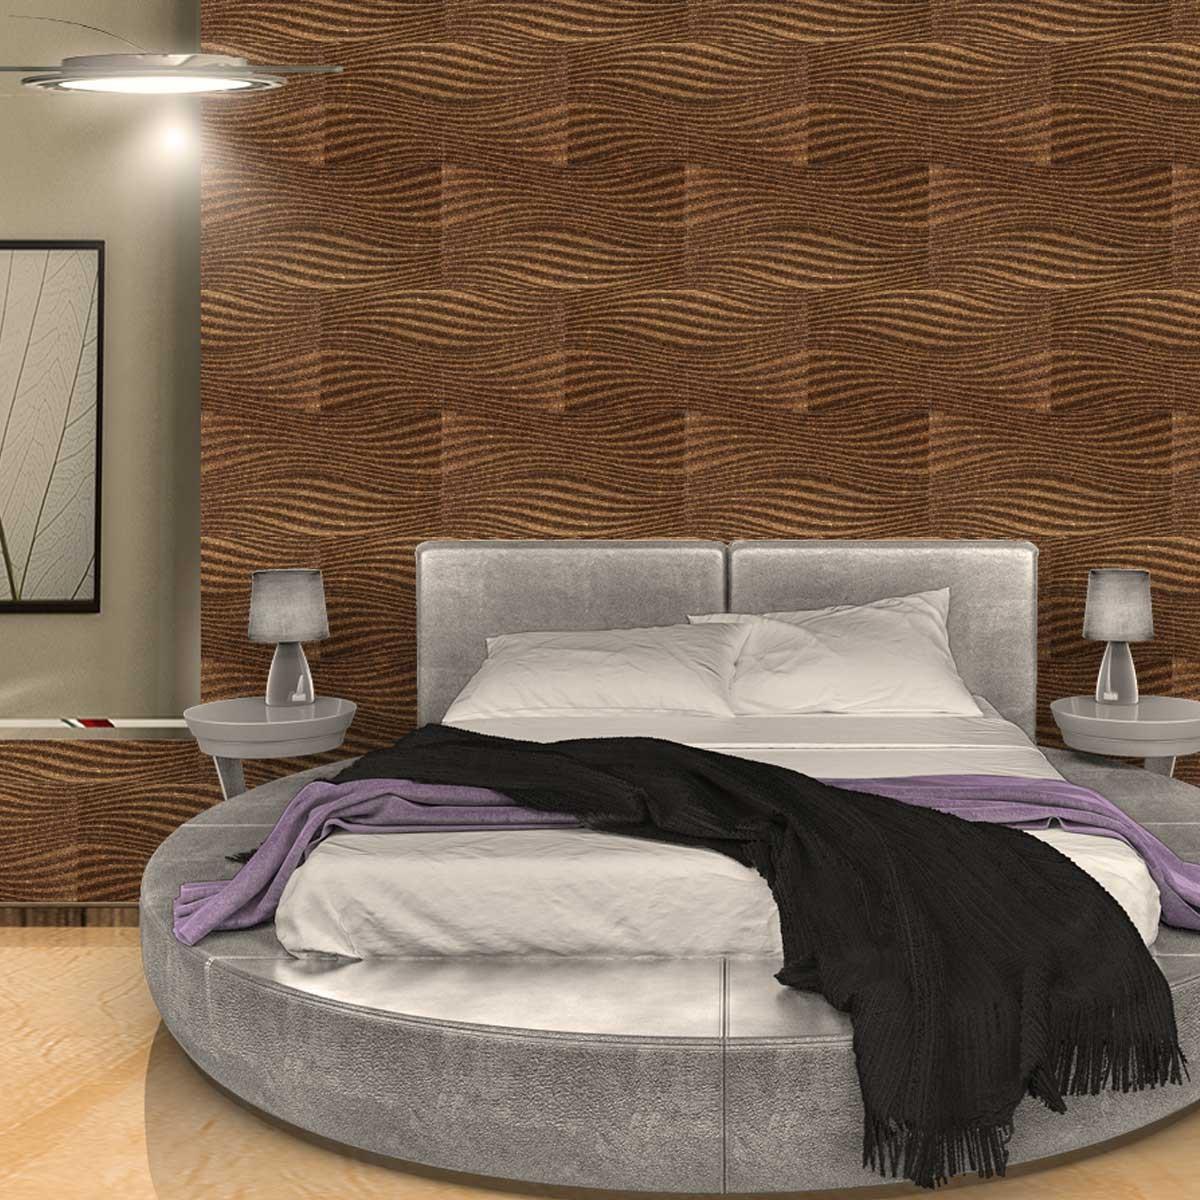 Pannelli decorativi 3d per pareti e soffitti - Parete di sughero ...